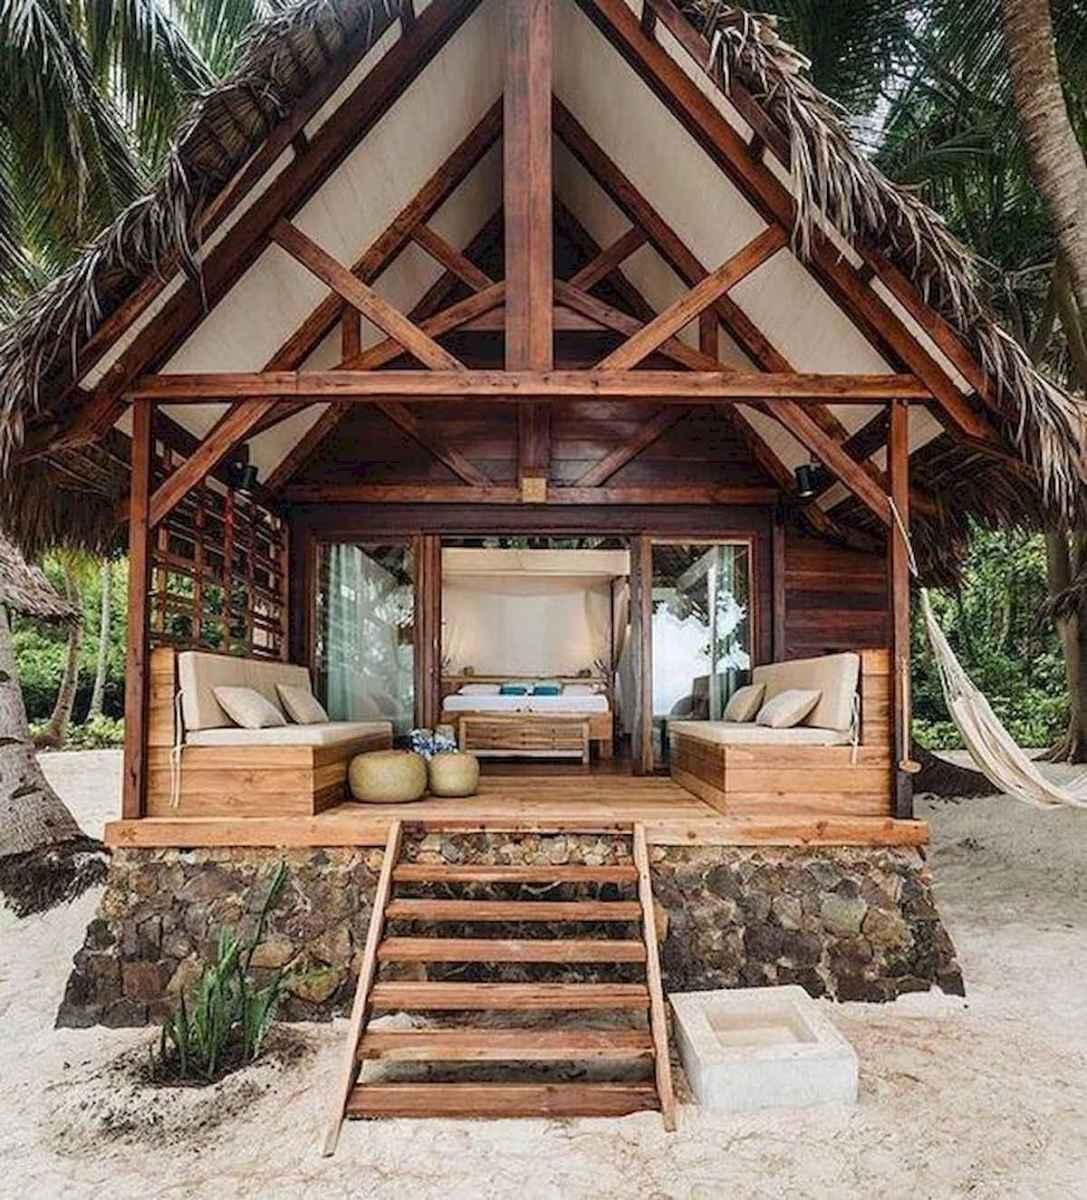 70 Suprising Small Log Cabin Homes Design Ideas (38)